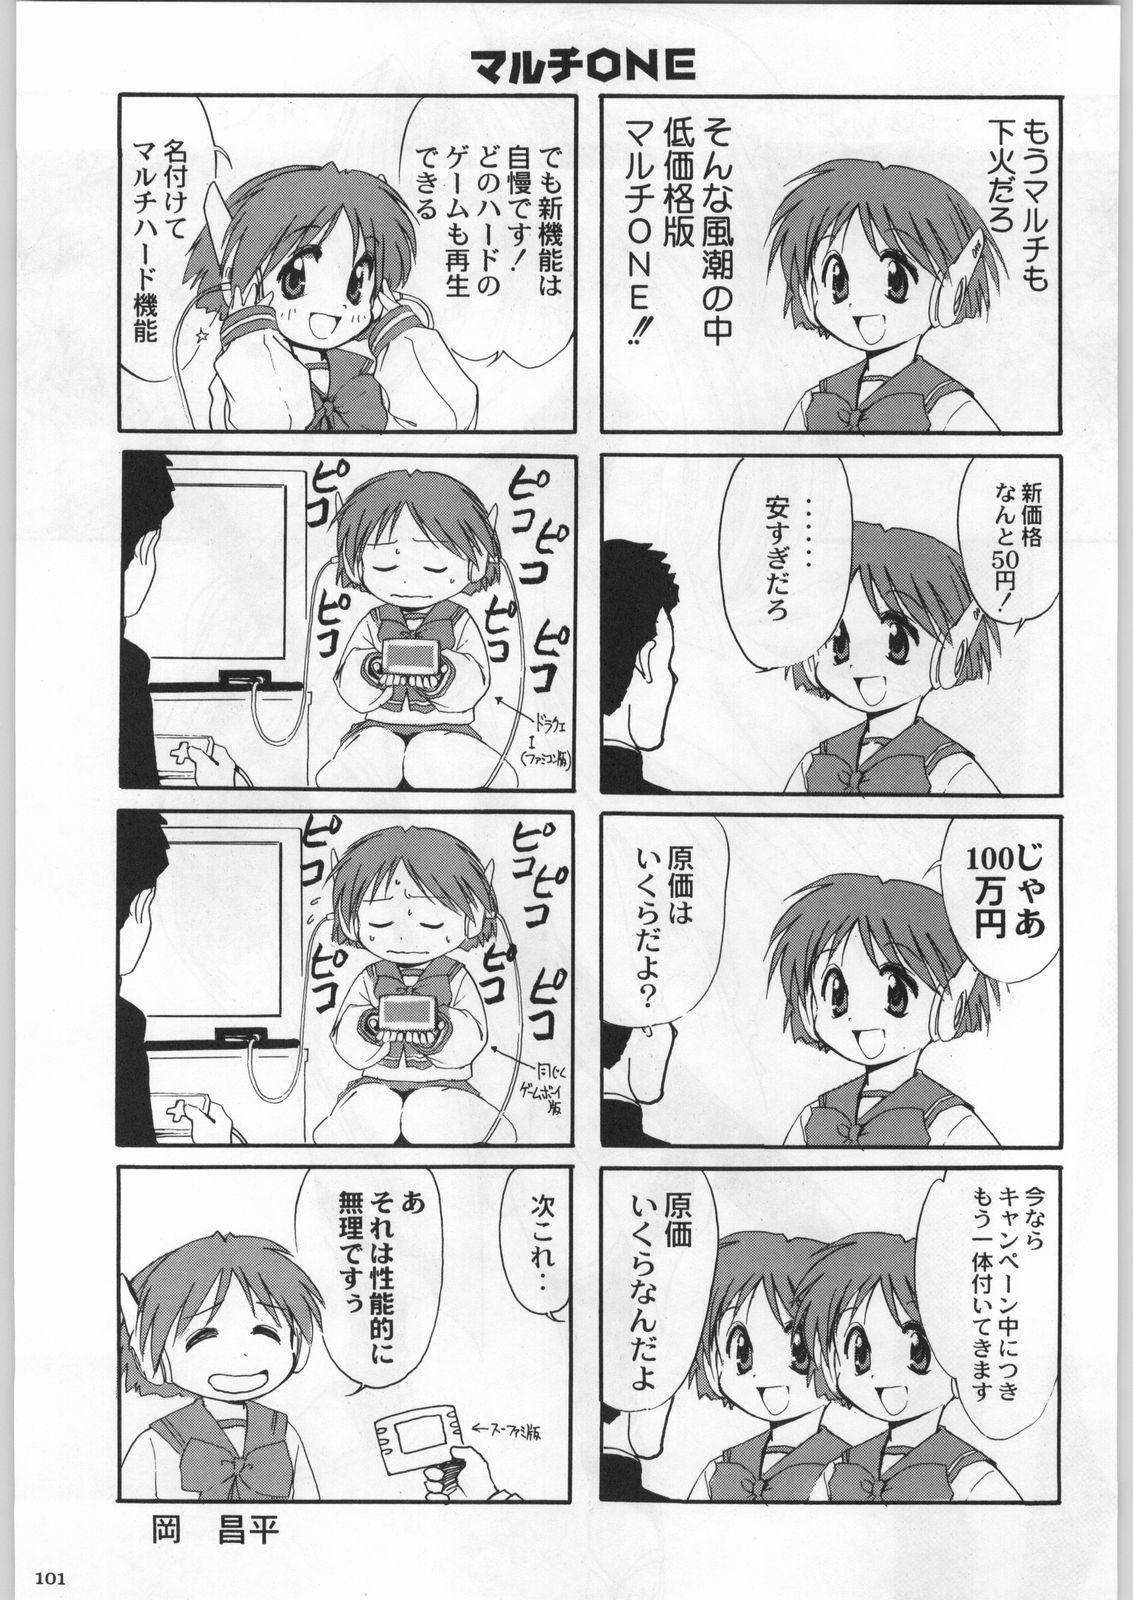 Takayukashiki Mobile Suits 99